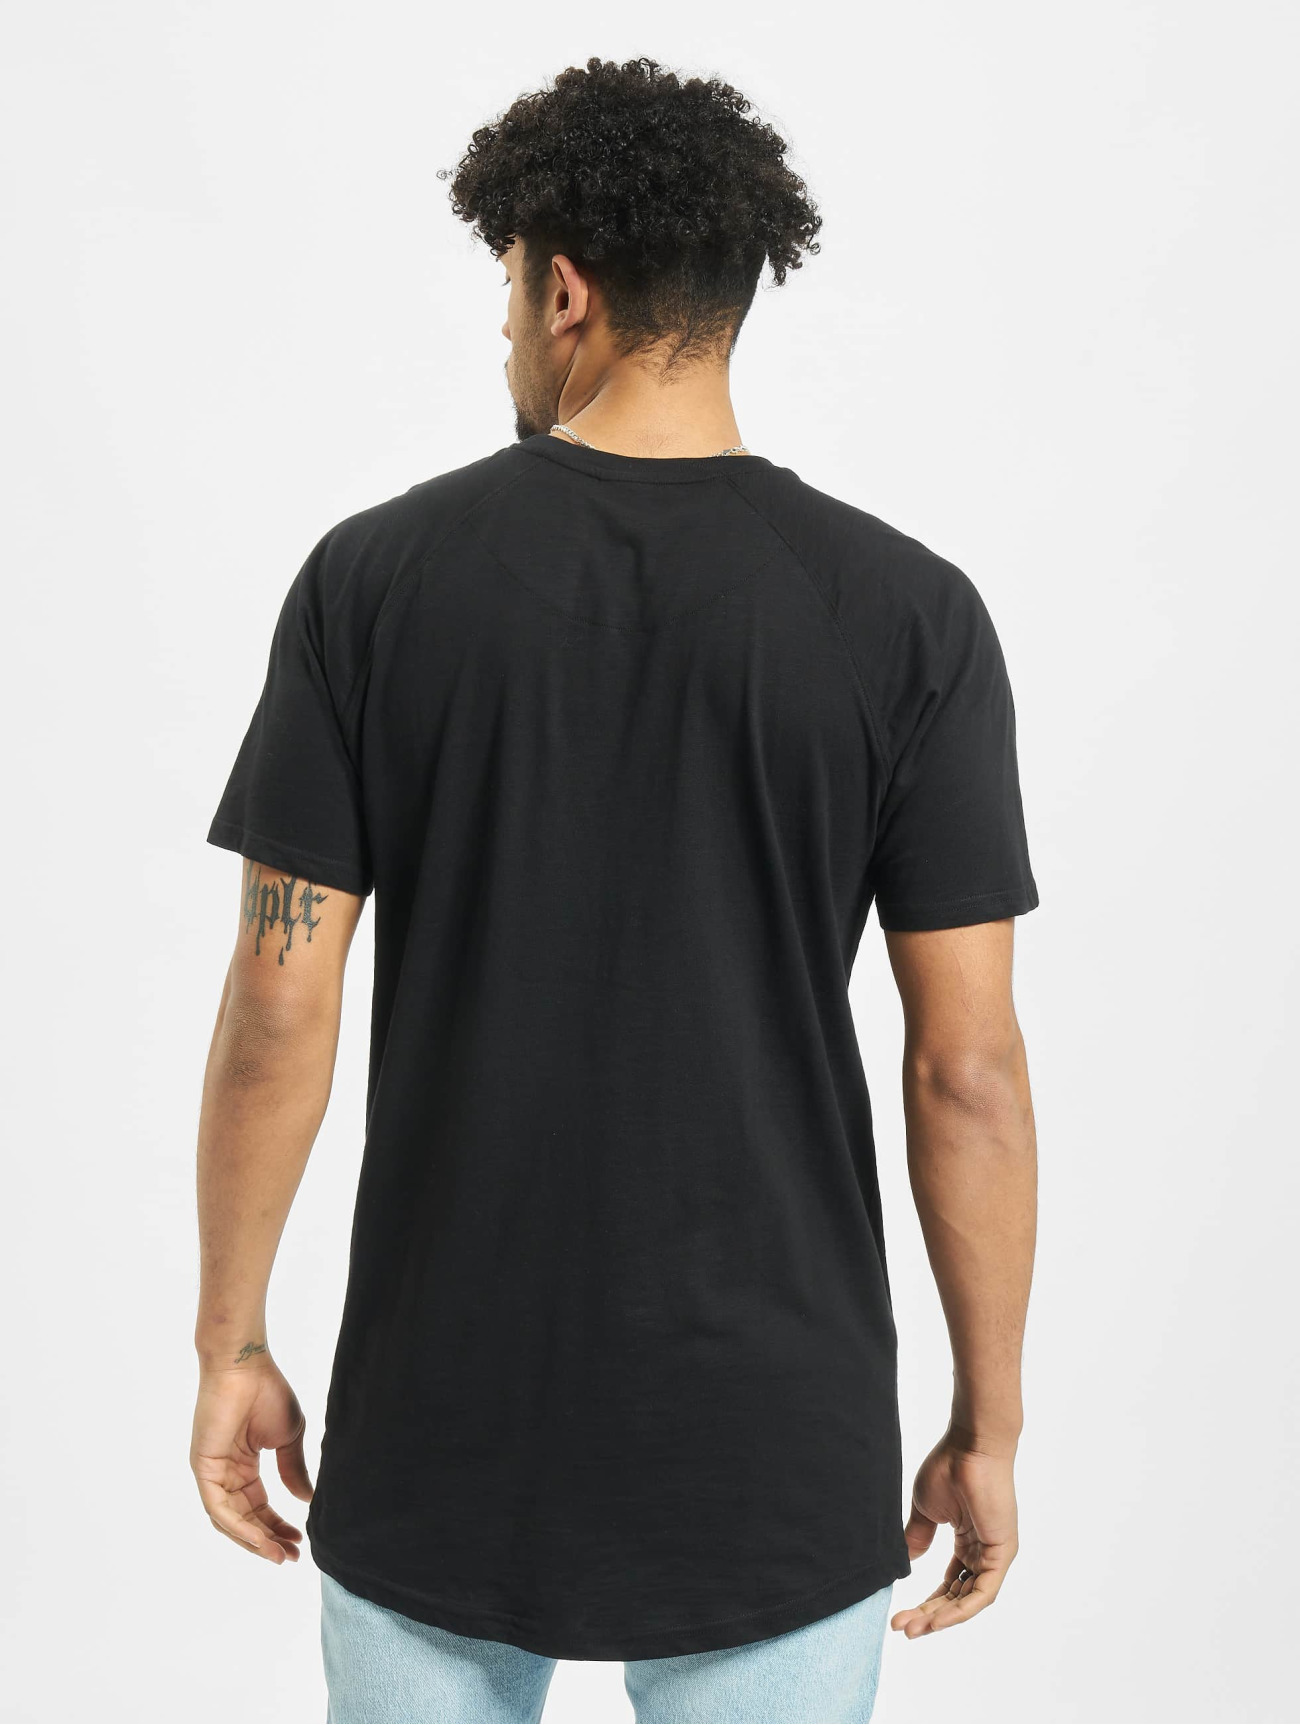 Urban Classics | Long Shaped Slub Raglan noir Homme T-Shirt 183743| Homme Hauts